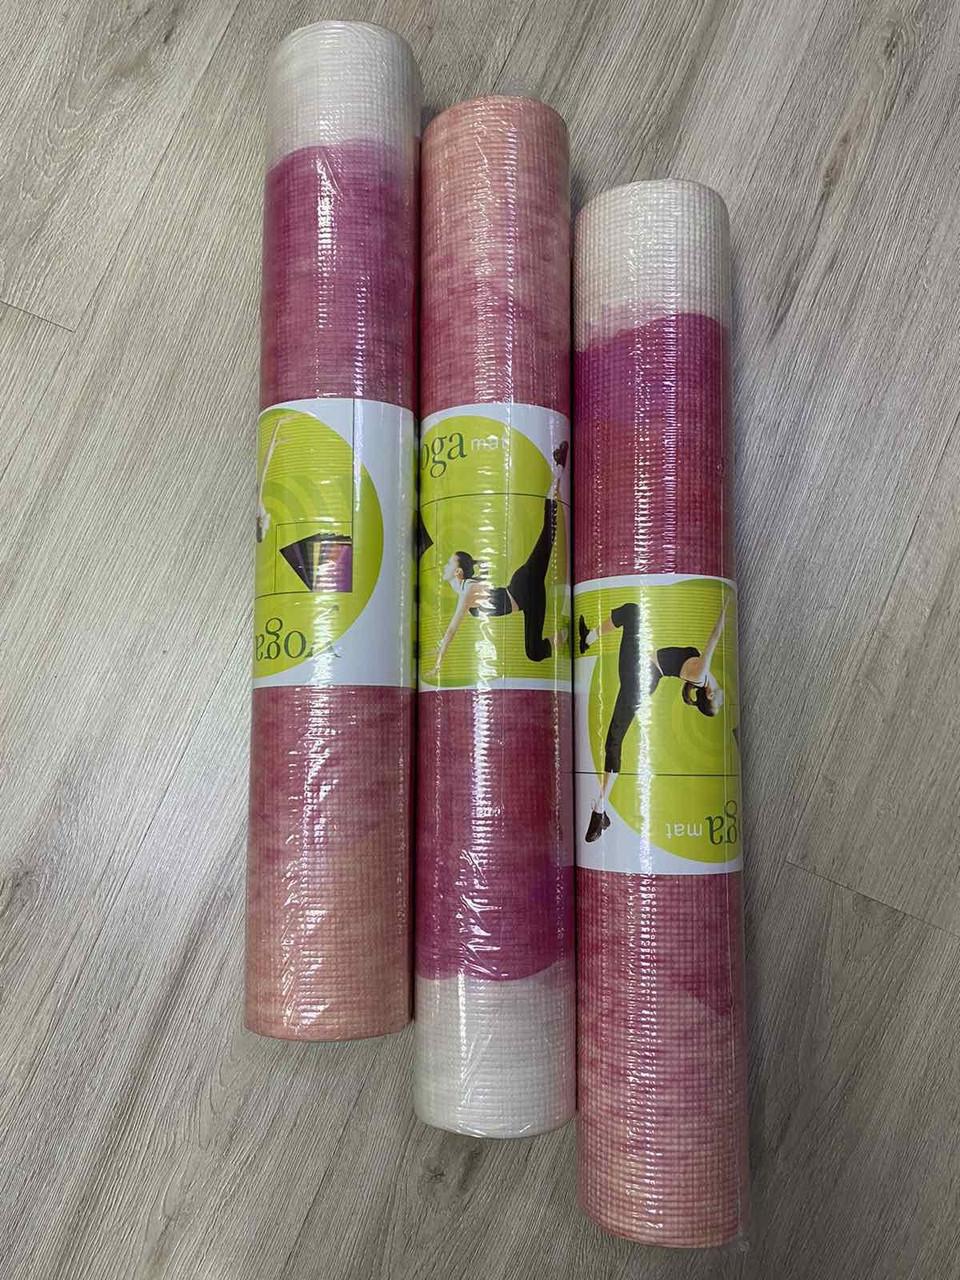 Коврик для йоги и фитнеса MS-1847-2 173х61 см, 4мм, йогамат